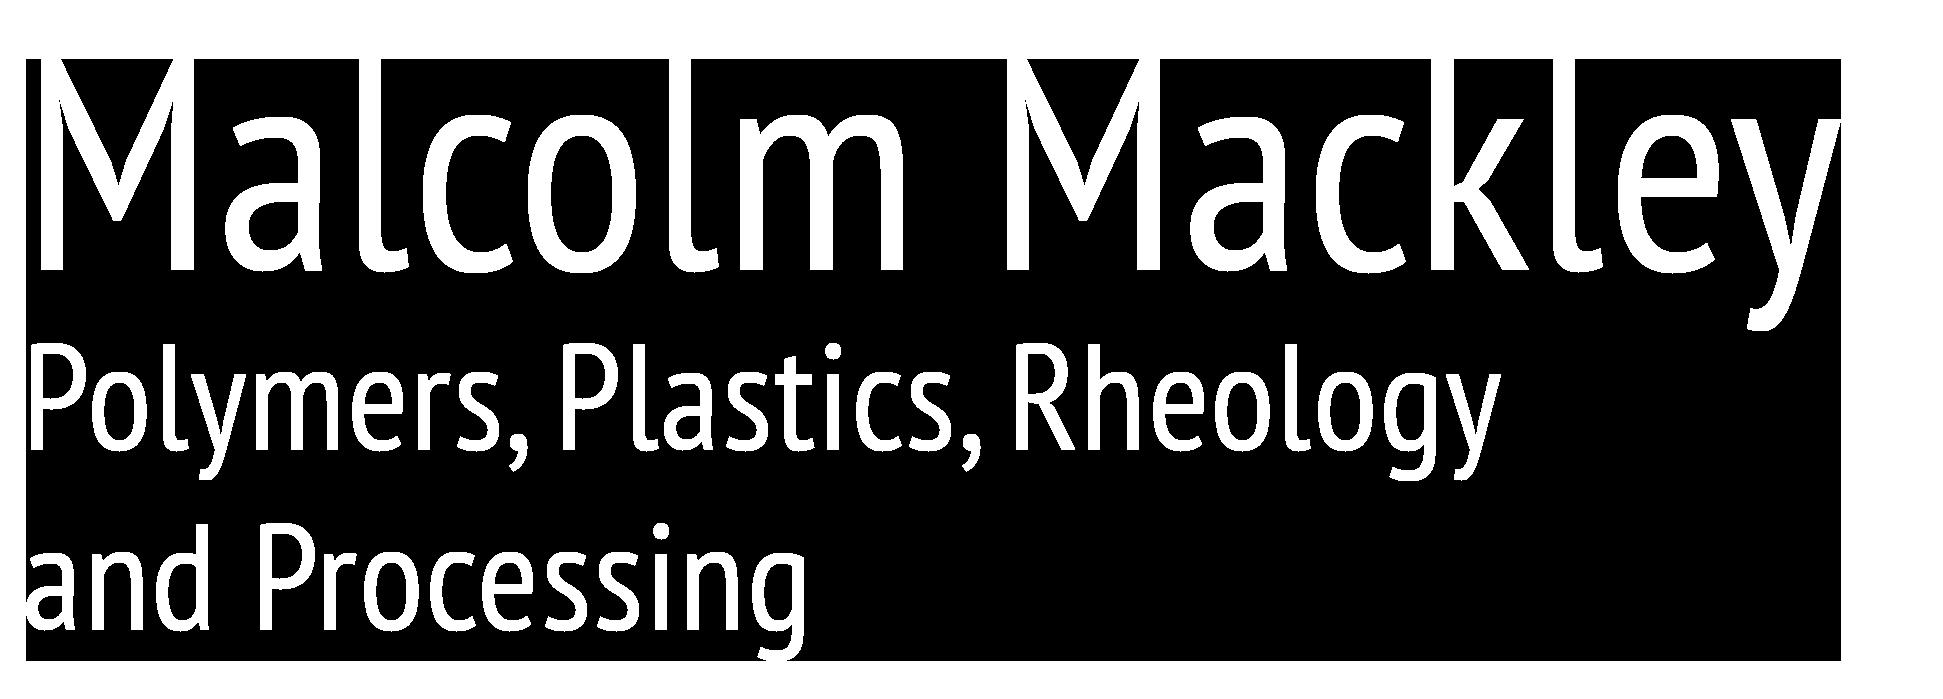 Malcolm Mackley